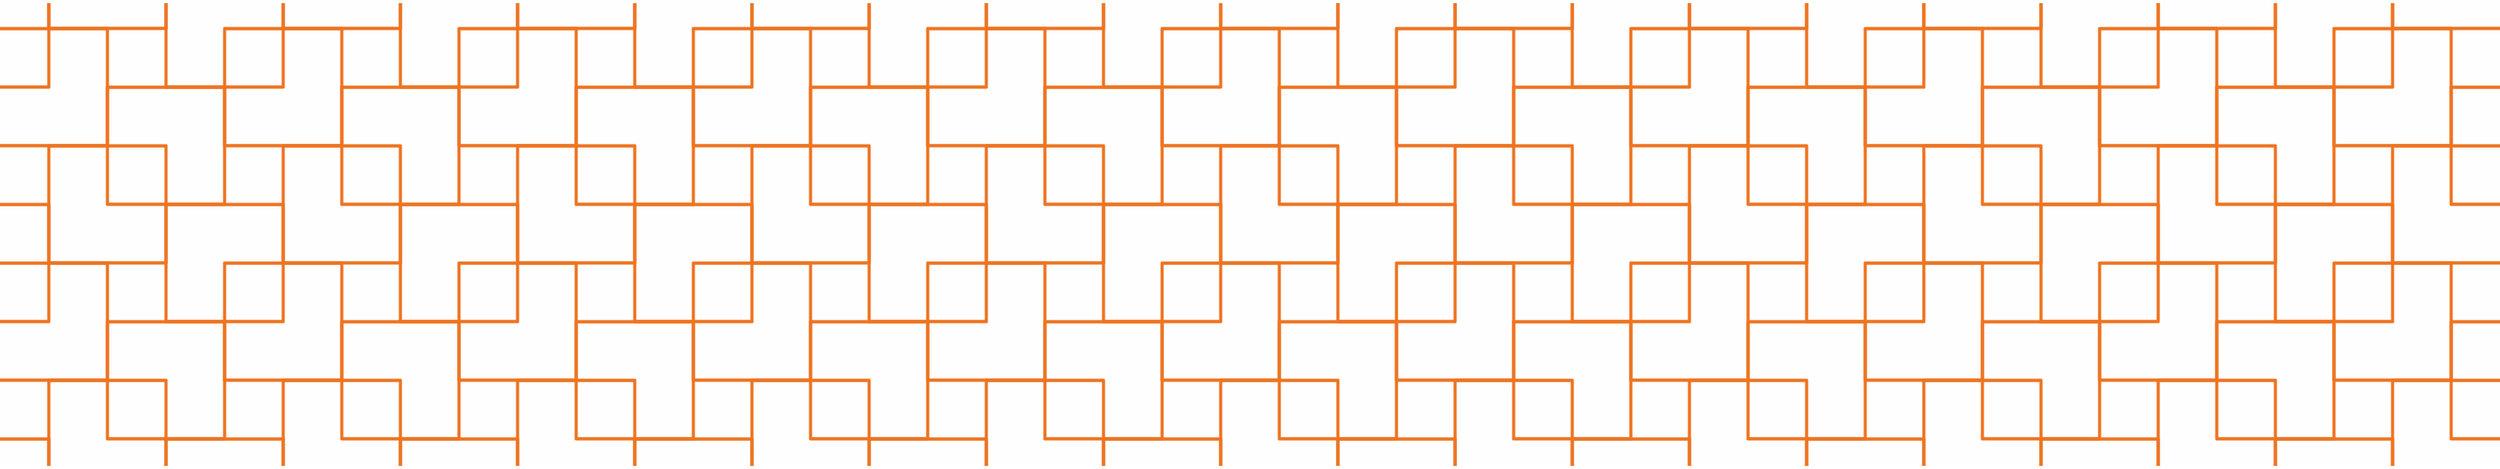 coa-pattern_04@2x.jpg